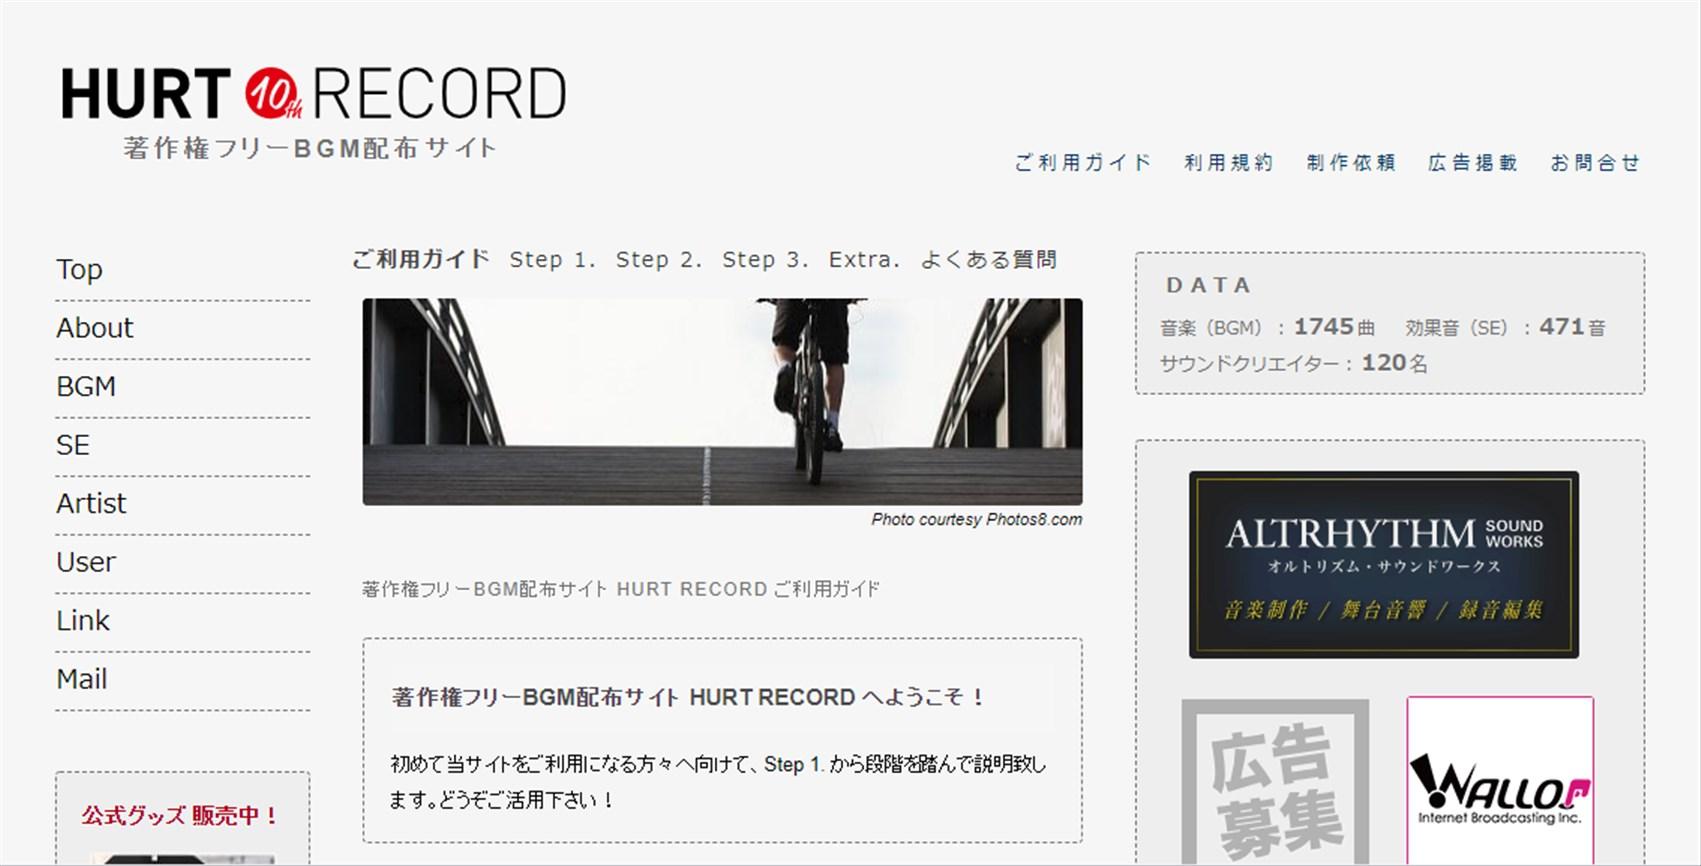 HURT RECORD